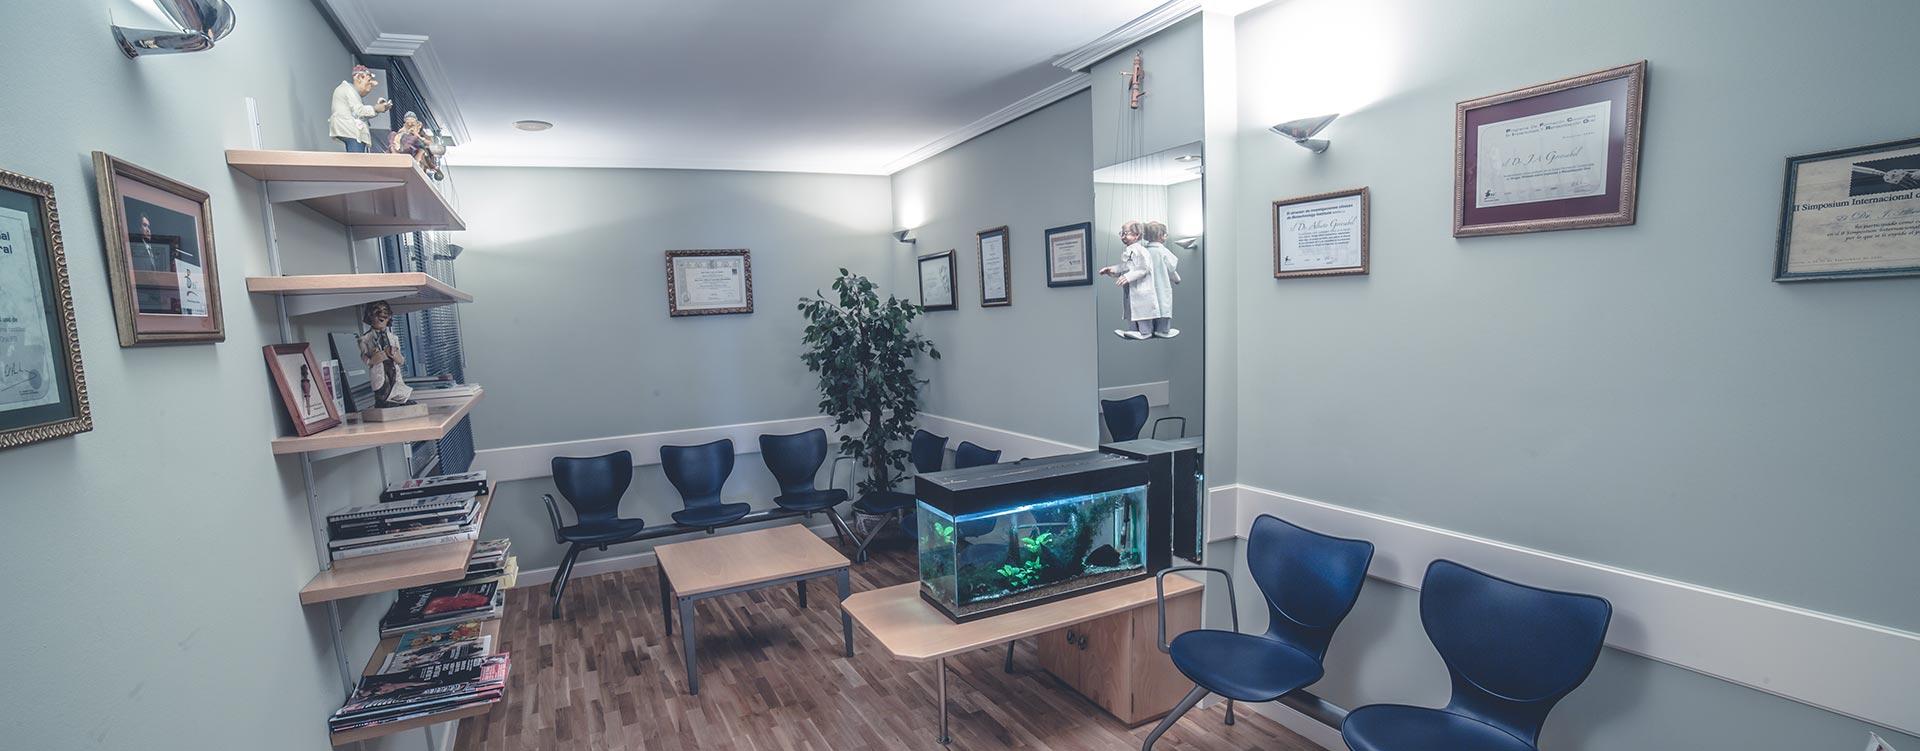 clinica-gorosabel-dental